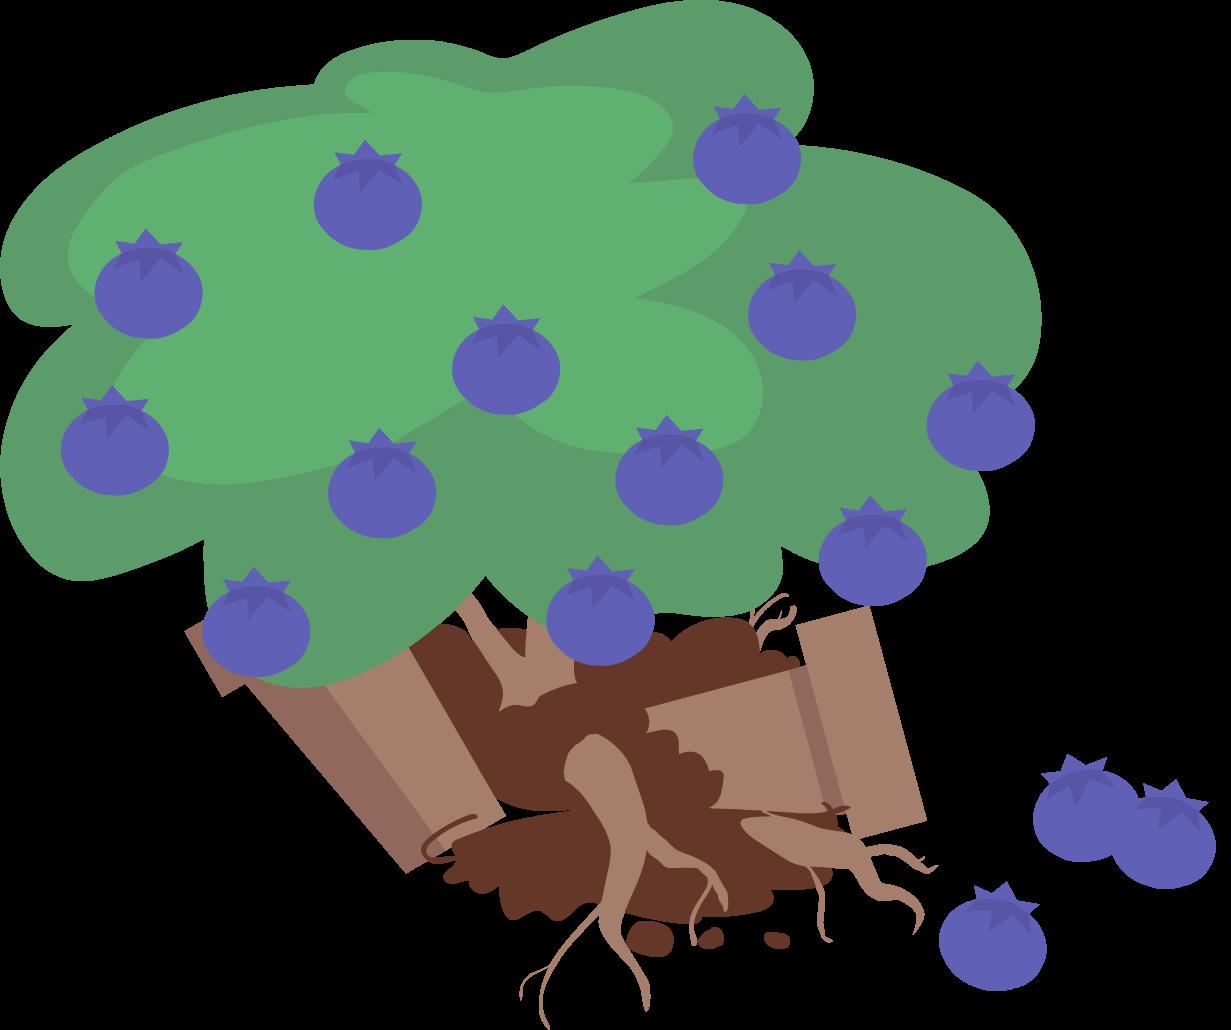 Image tree png battle. Doughnut clipart pile